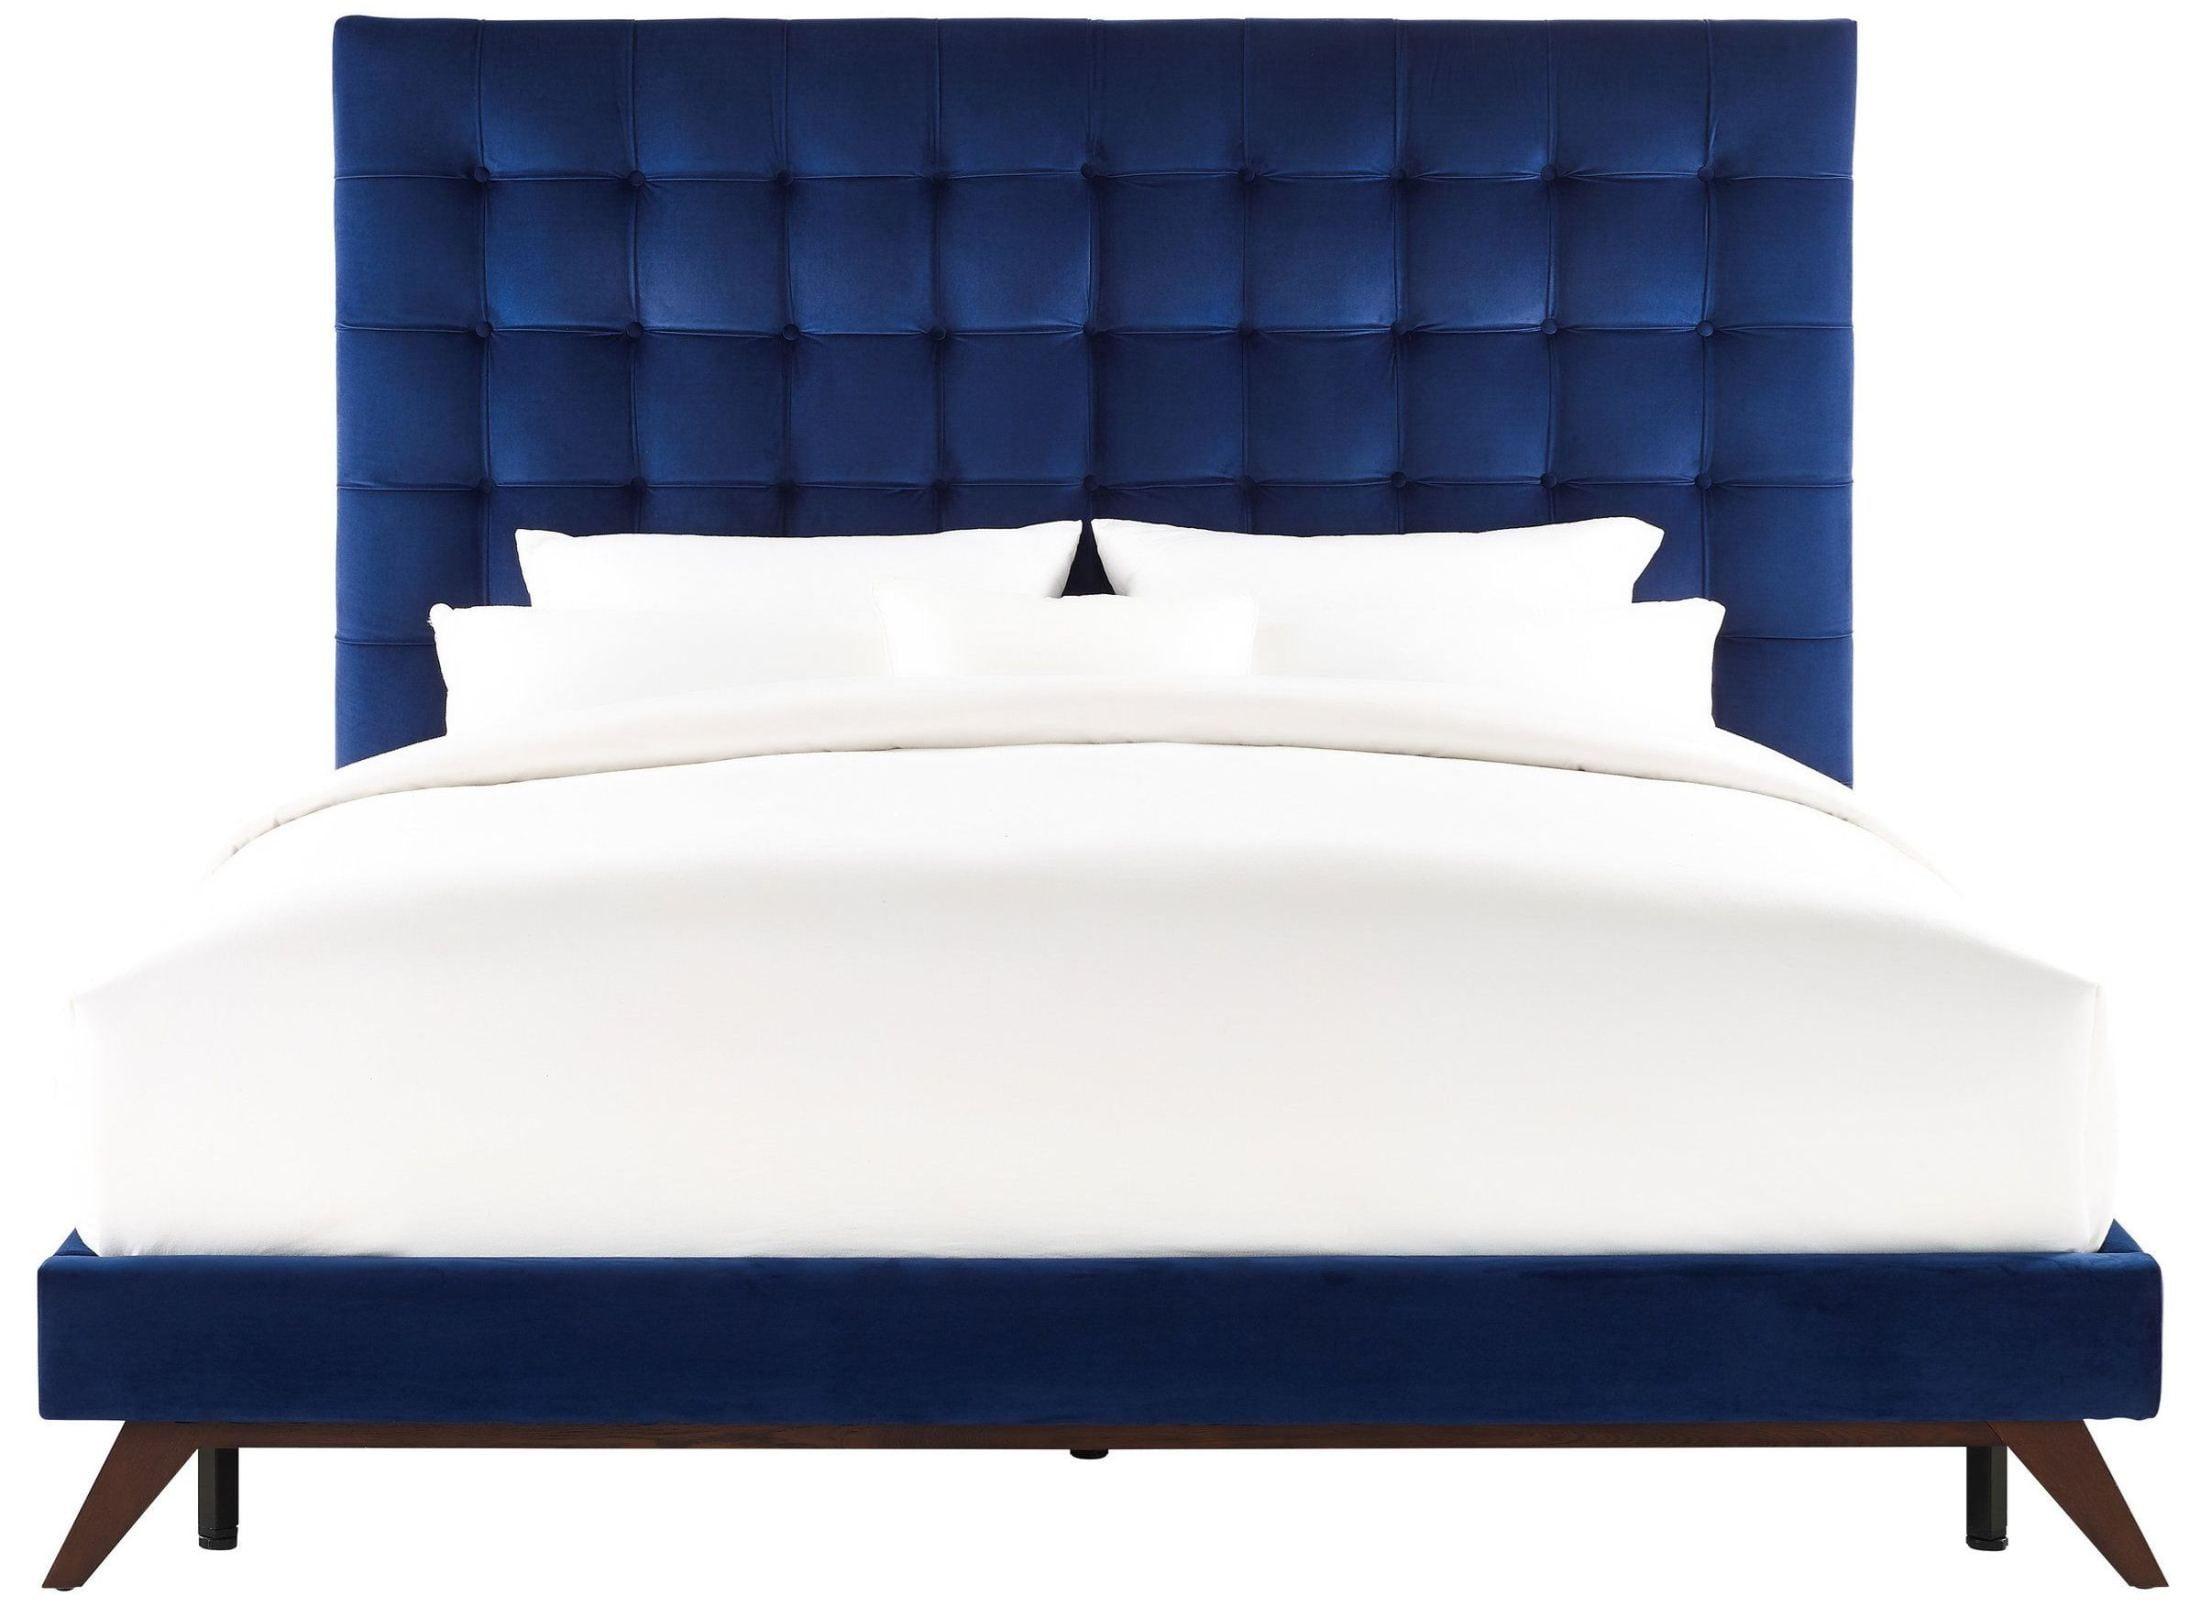 Eden Navy Velvet King Platform Bed From Tov Coleman